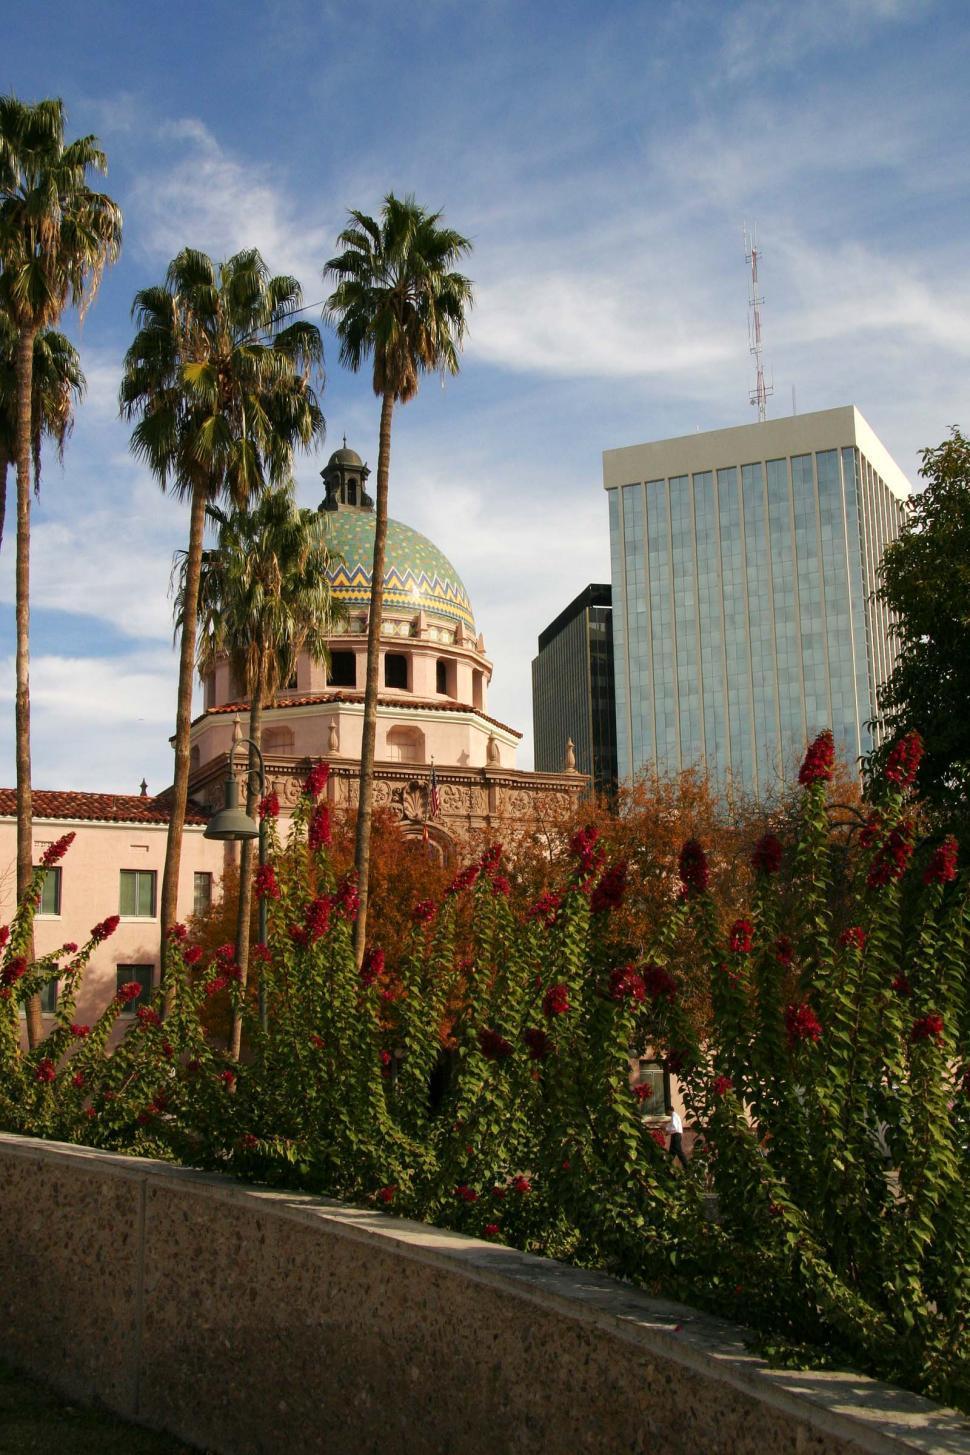 Download Free Stock HD Photo of Tucson El Presidio Park Online